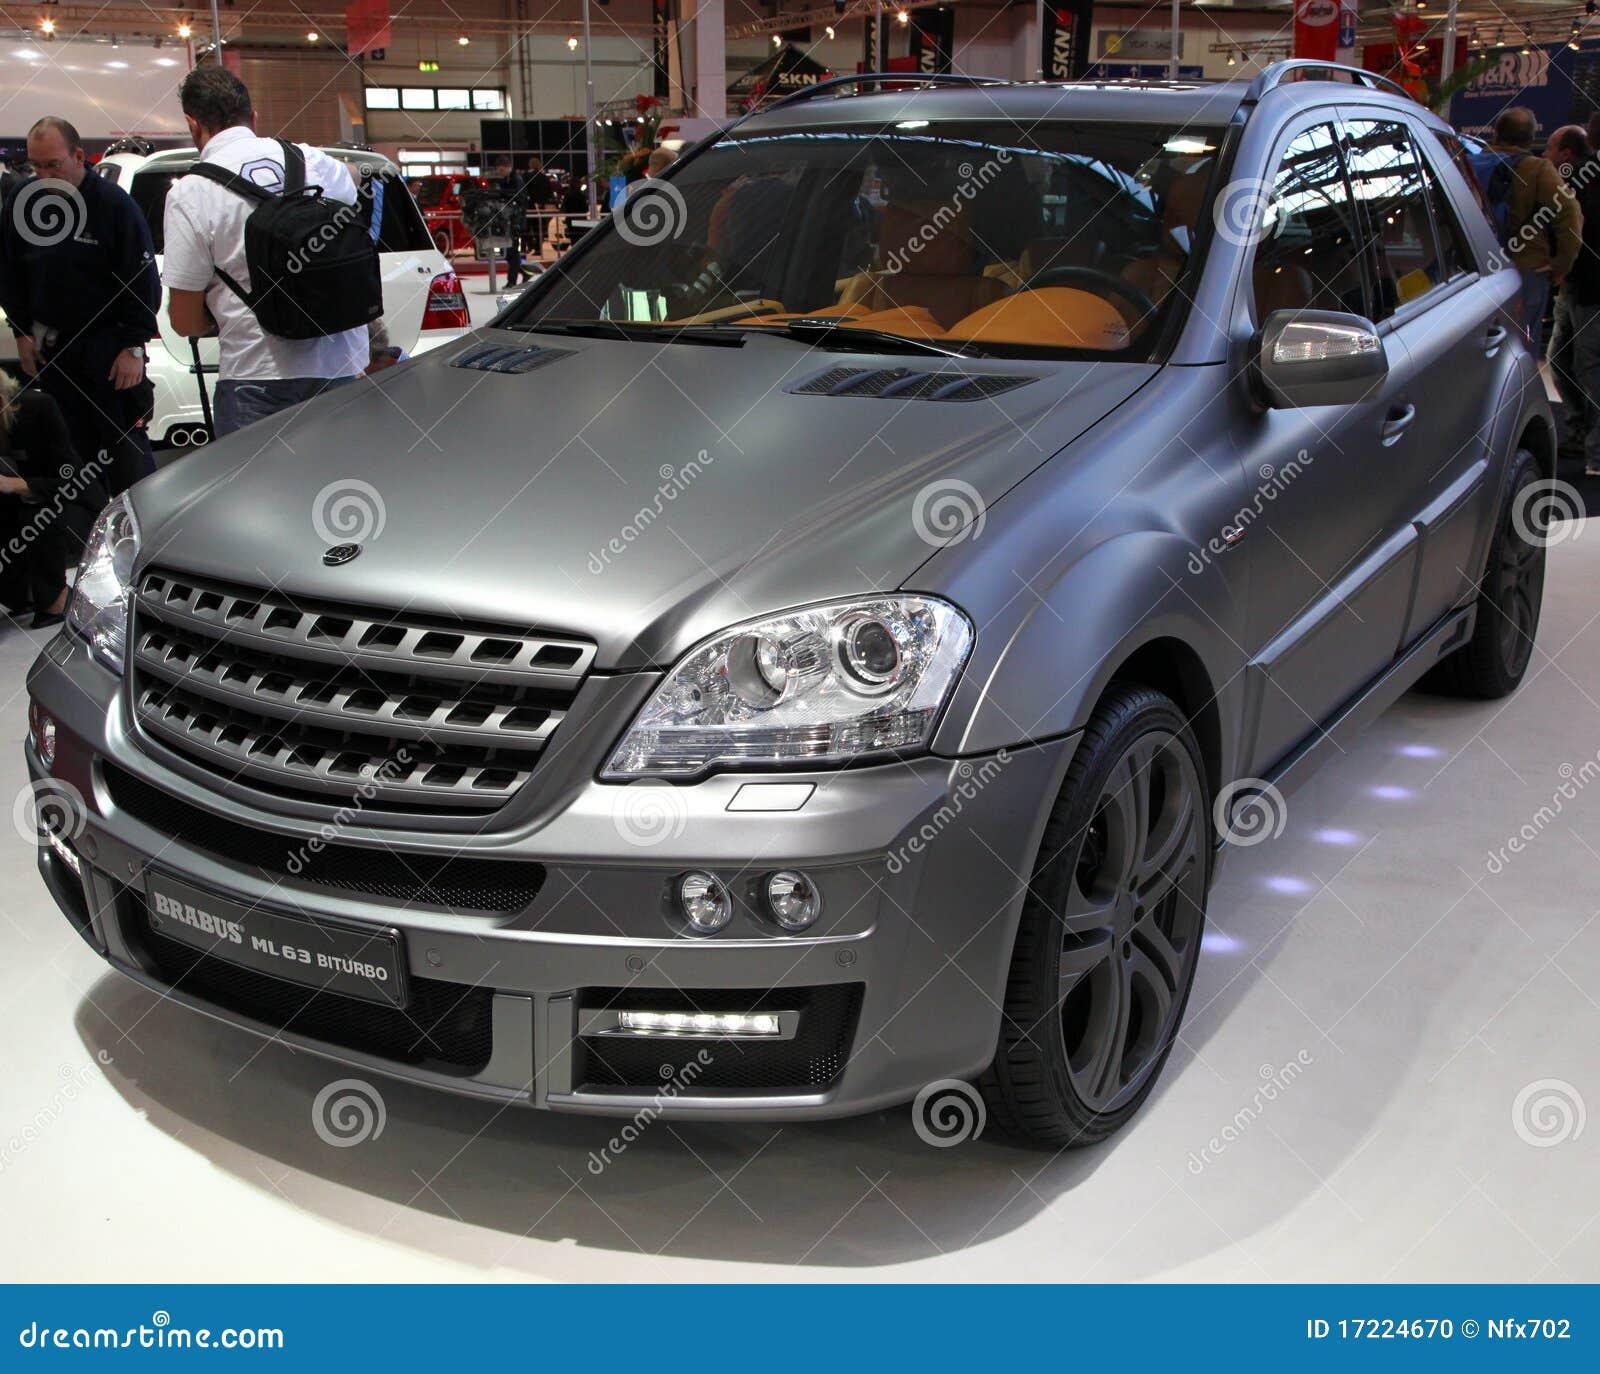 Mercedes benz 280sl car vehicl wrap mercedes benz merced pagoda - Brabus Ml 63 Biturbo Based On Merced Benz Ml Cla Stock Photo